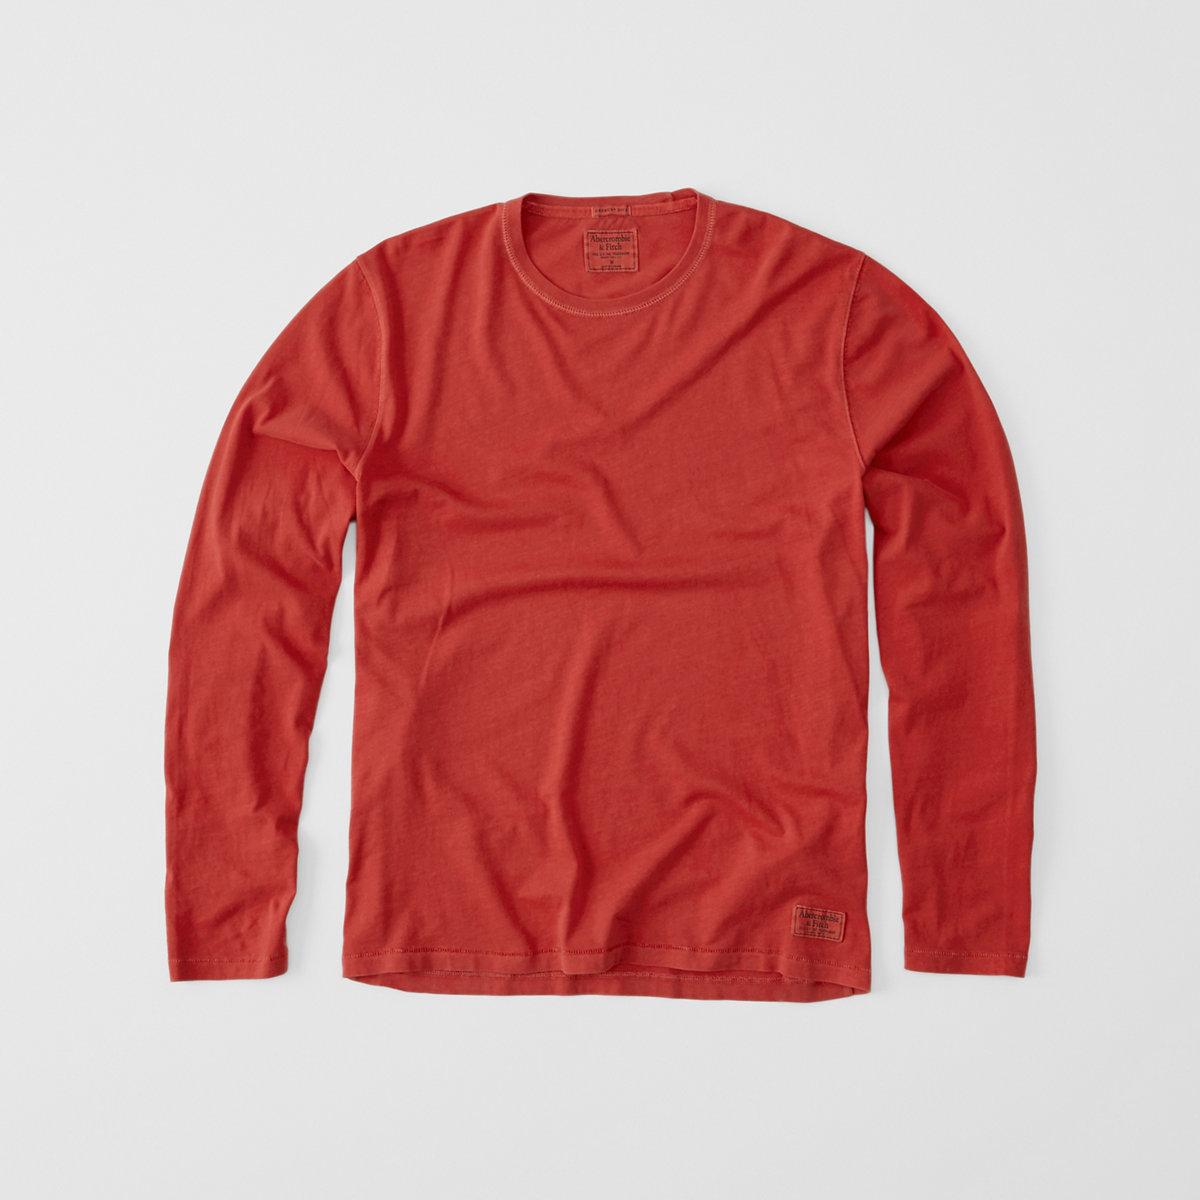 Long-Sleeve Garment Dye Tee